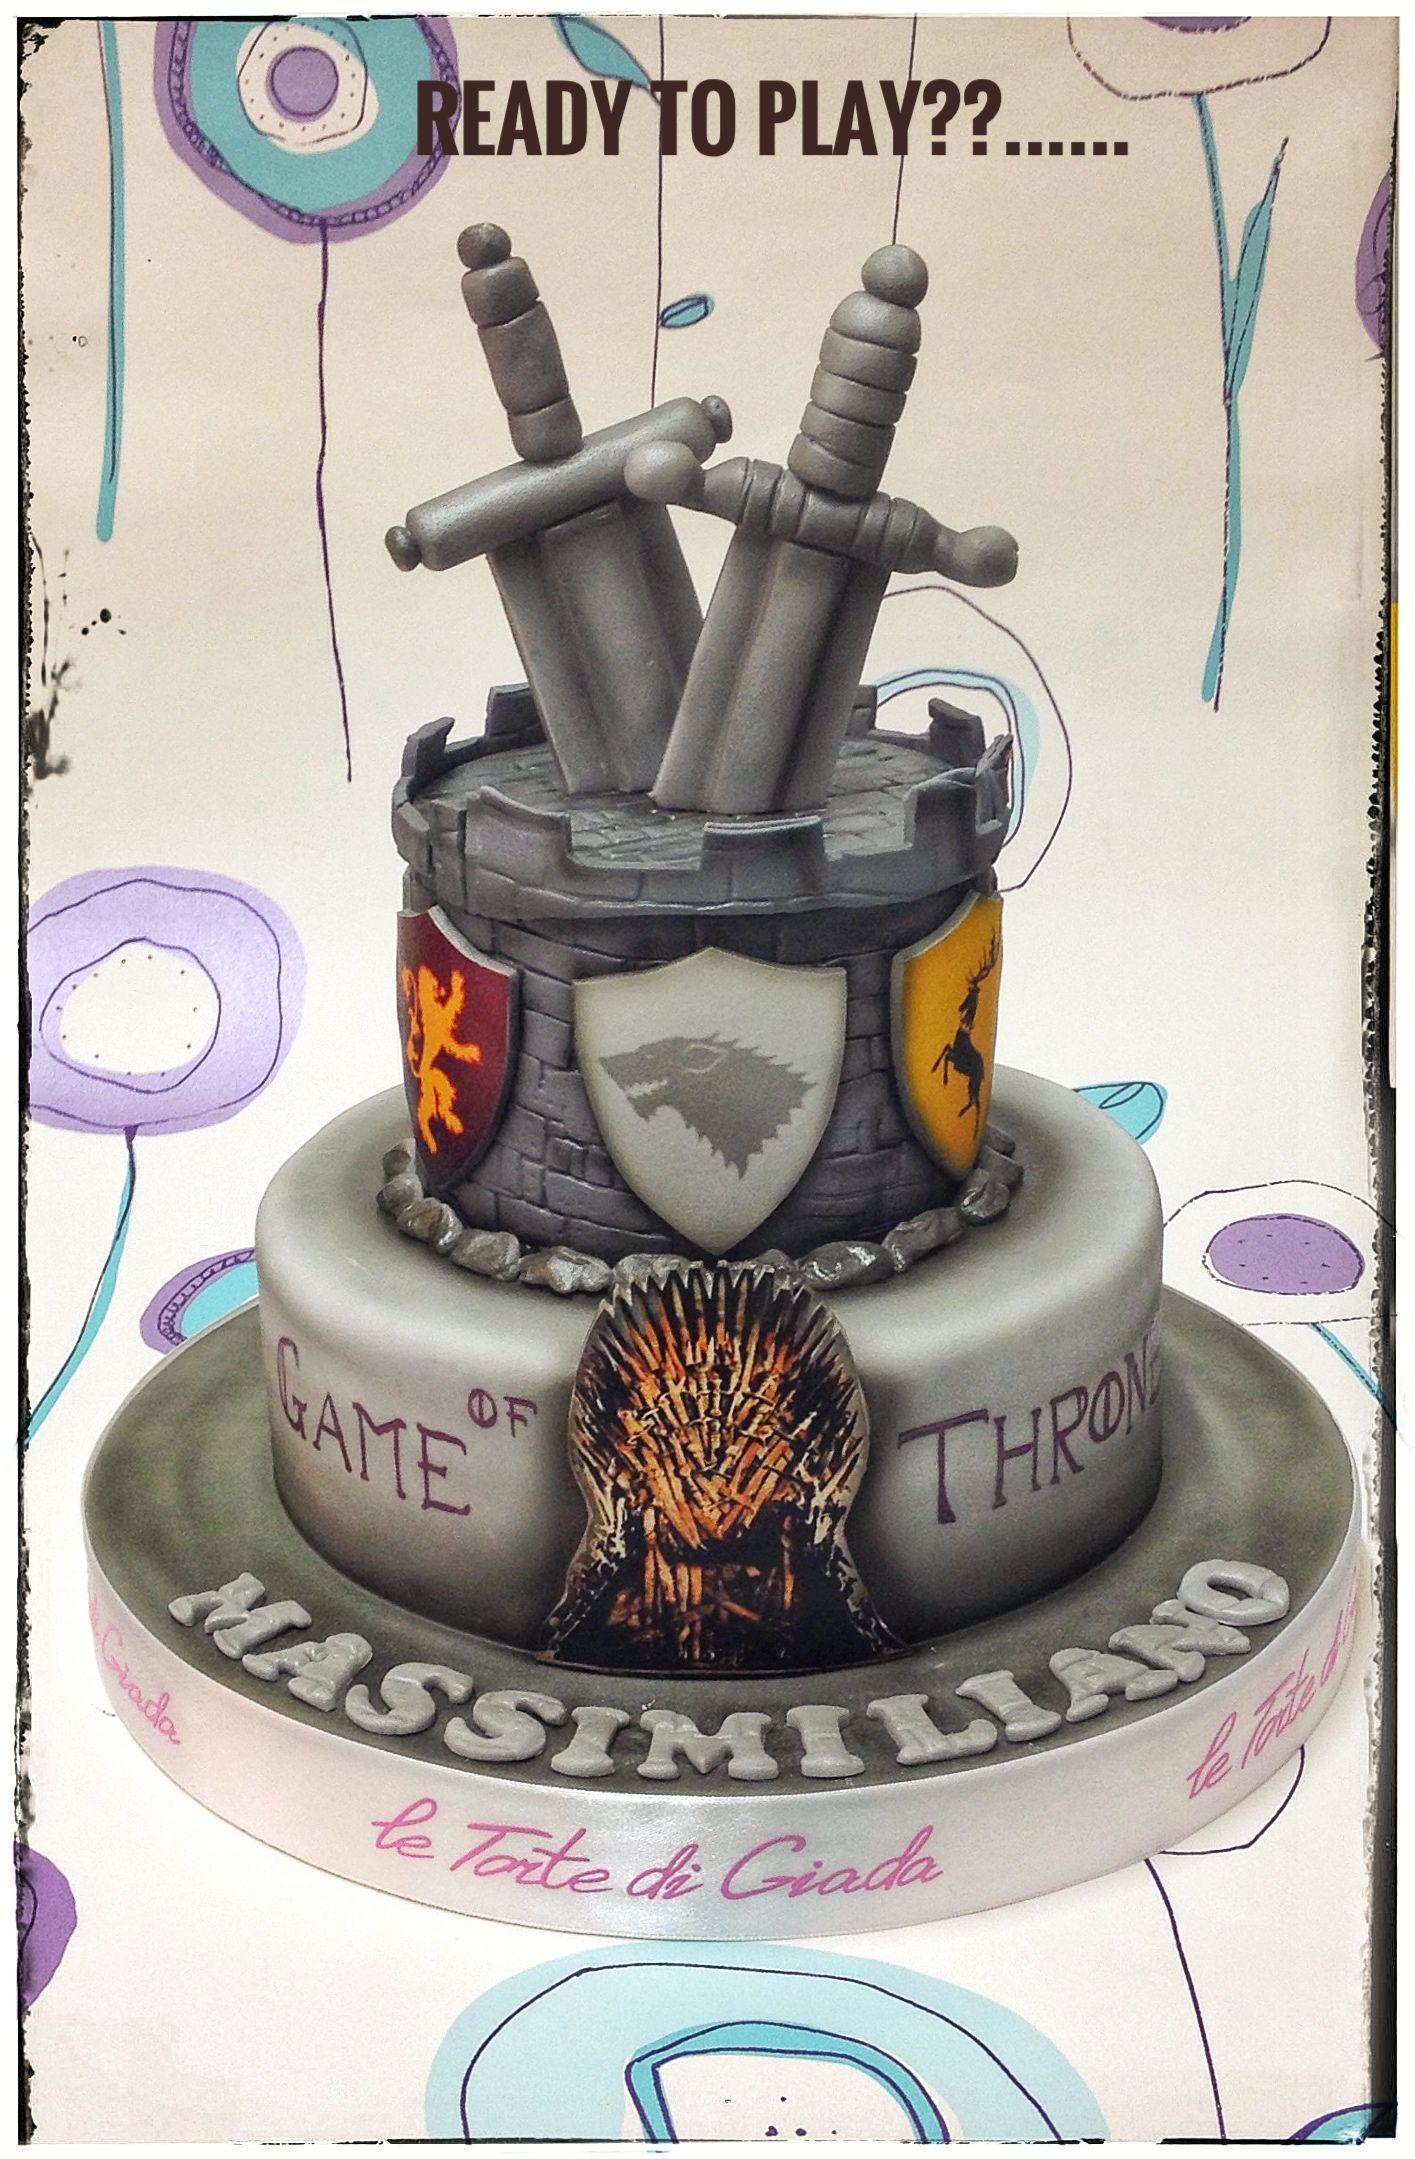 game of thrones theme of cake by le torte di giada brescia. Black Bedroom Furniture Sets. Home Design Ideas